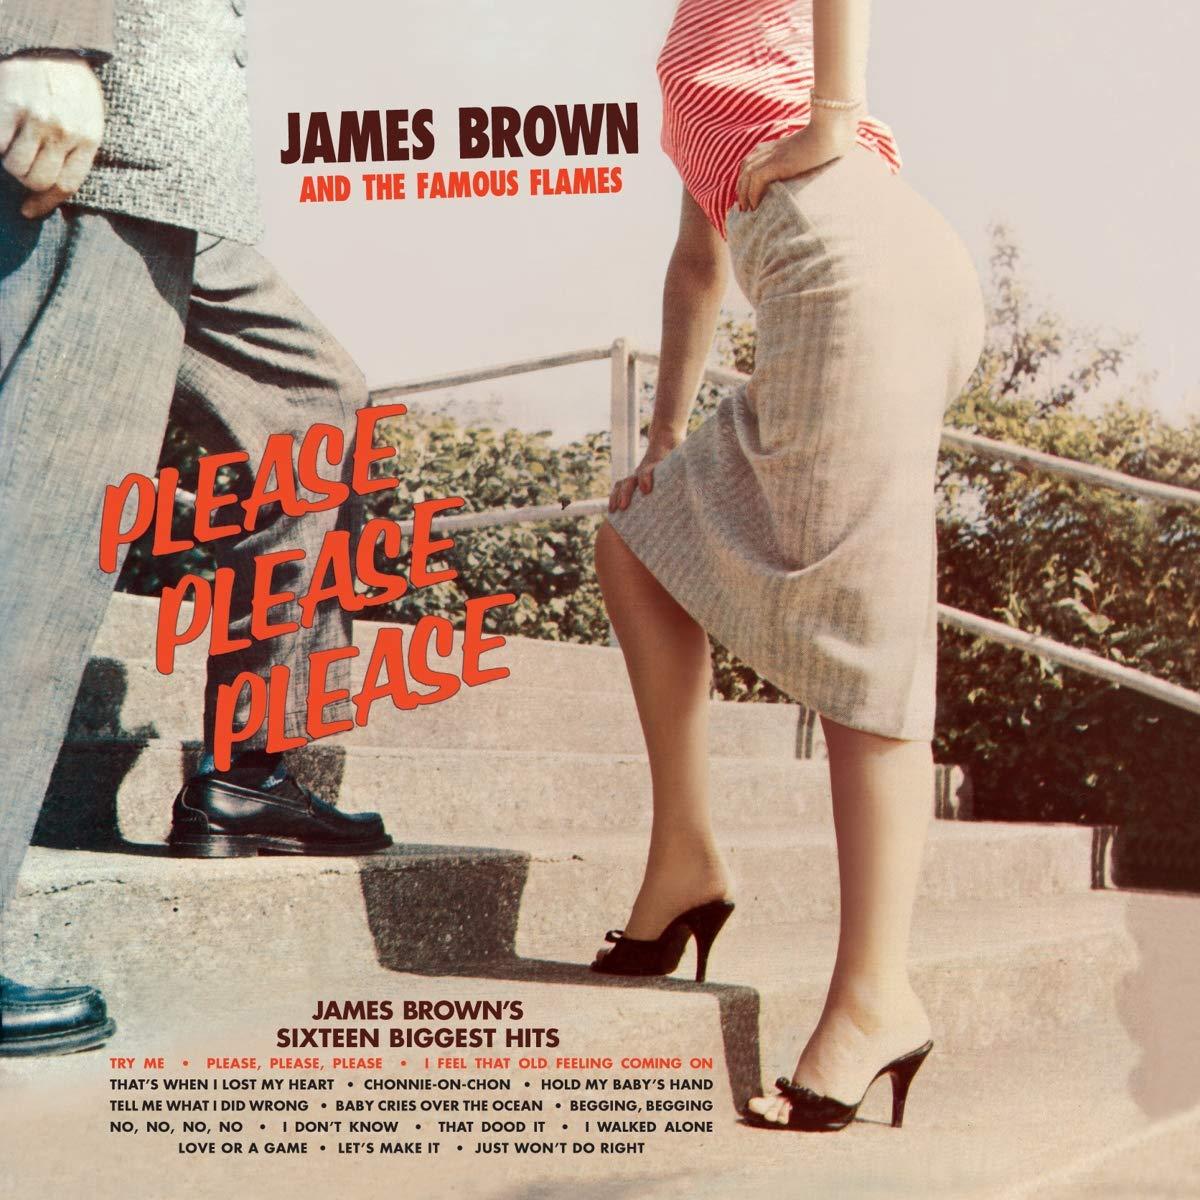 Vinilo : James Brown - Please Please Please (180 Gram Vinyl, Colored Vinyl, Limited Edition, Bonus Track, Remastered)